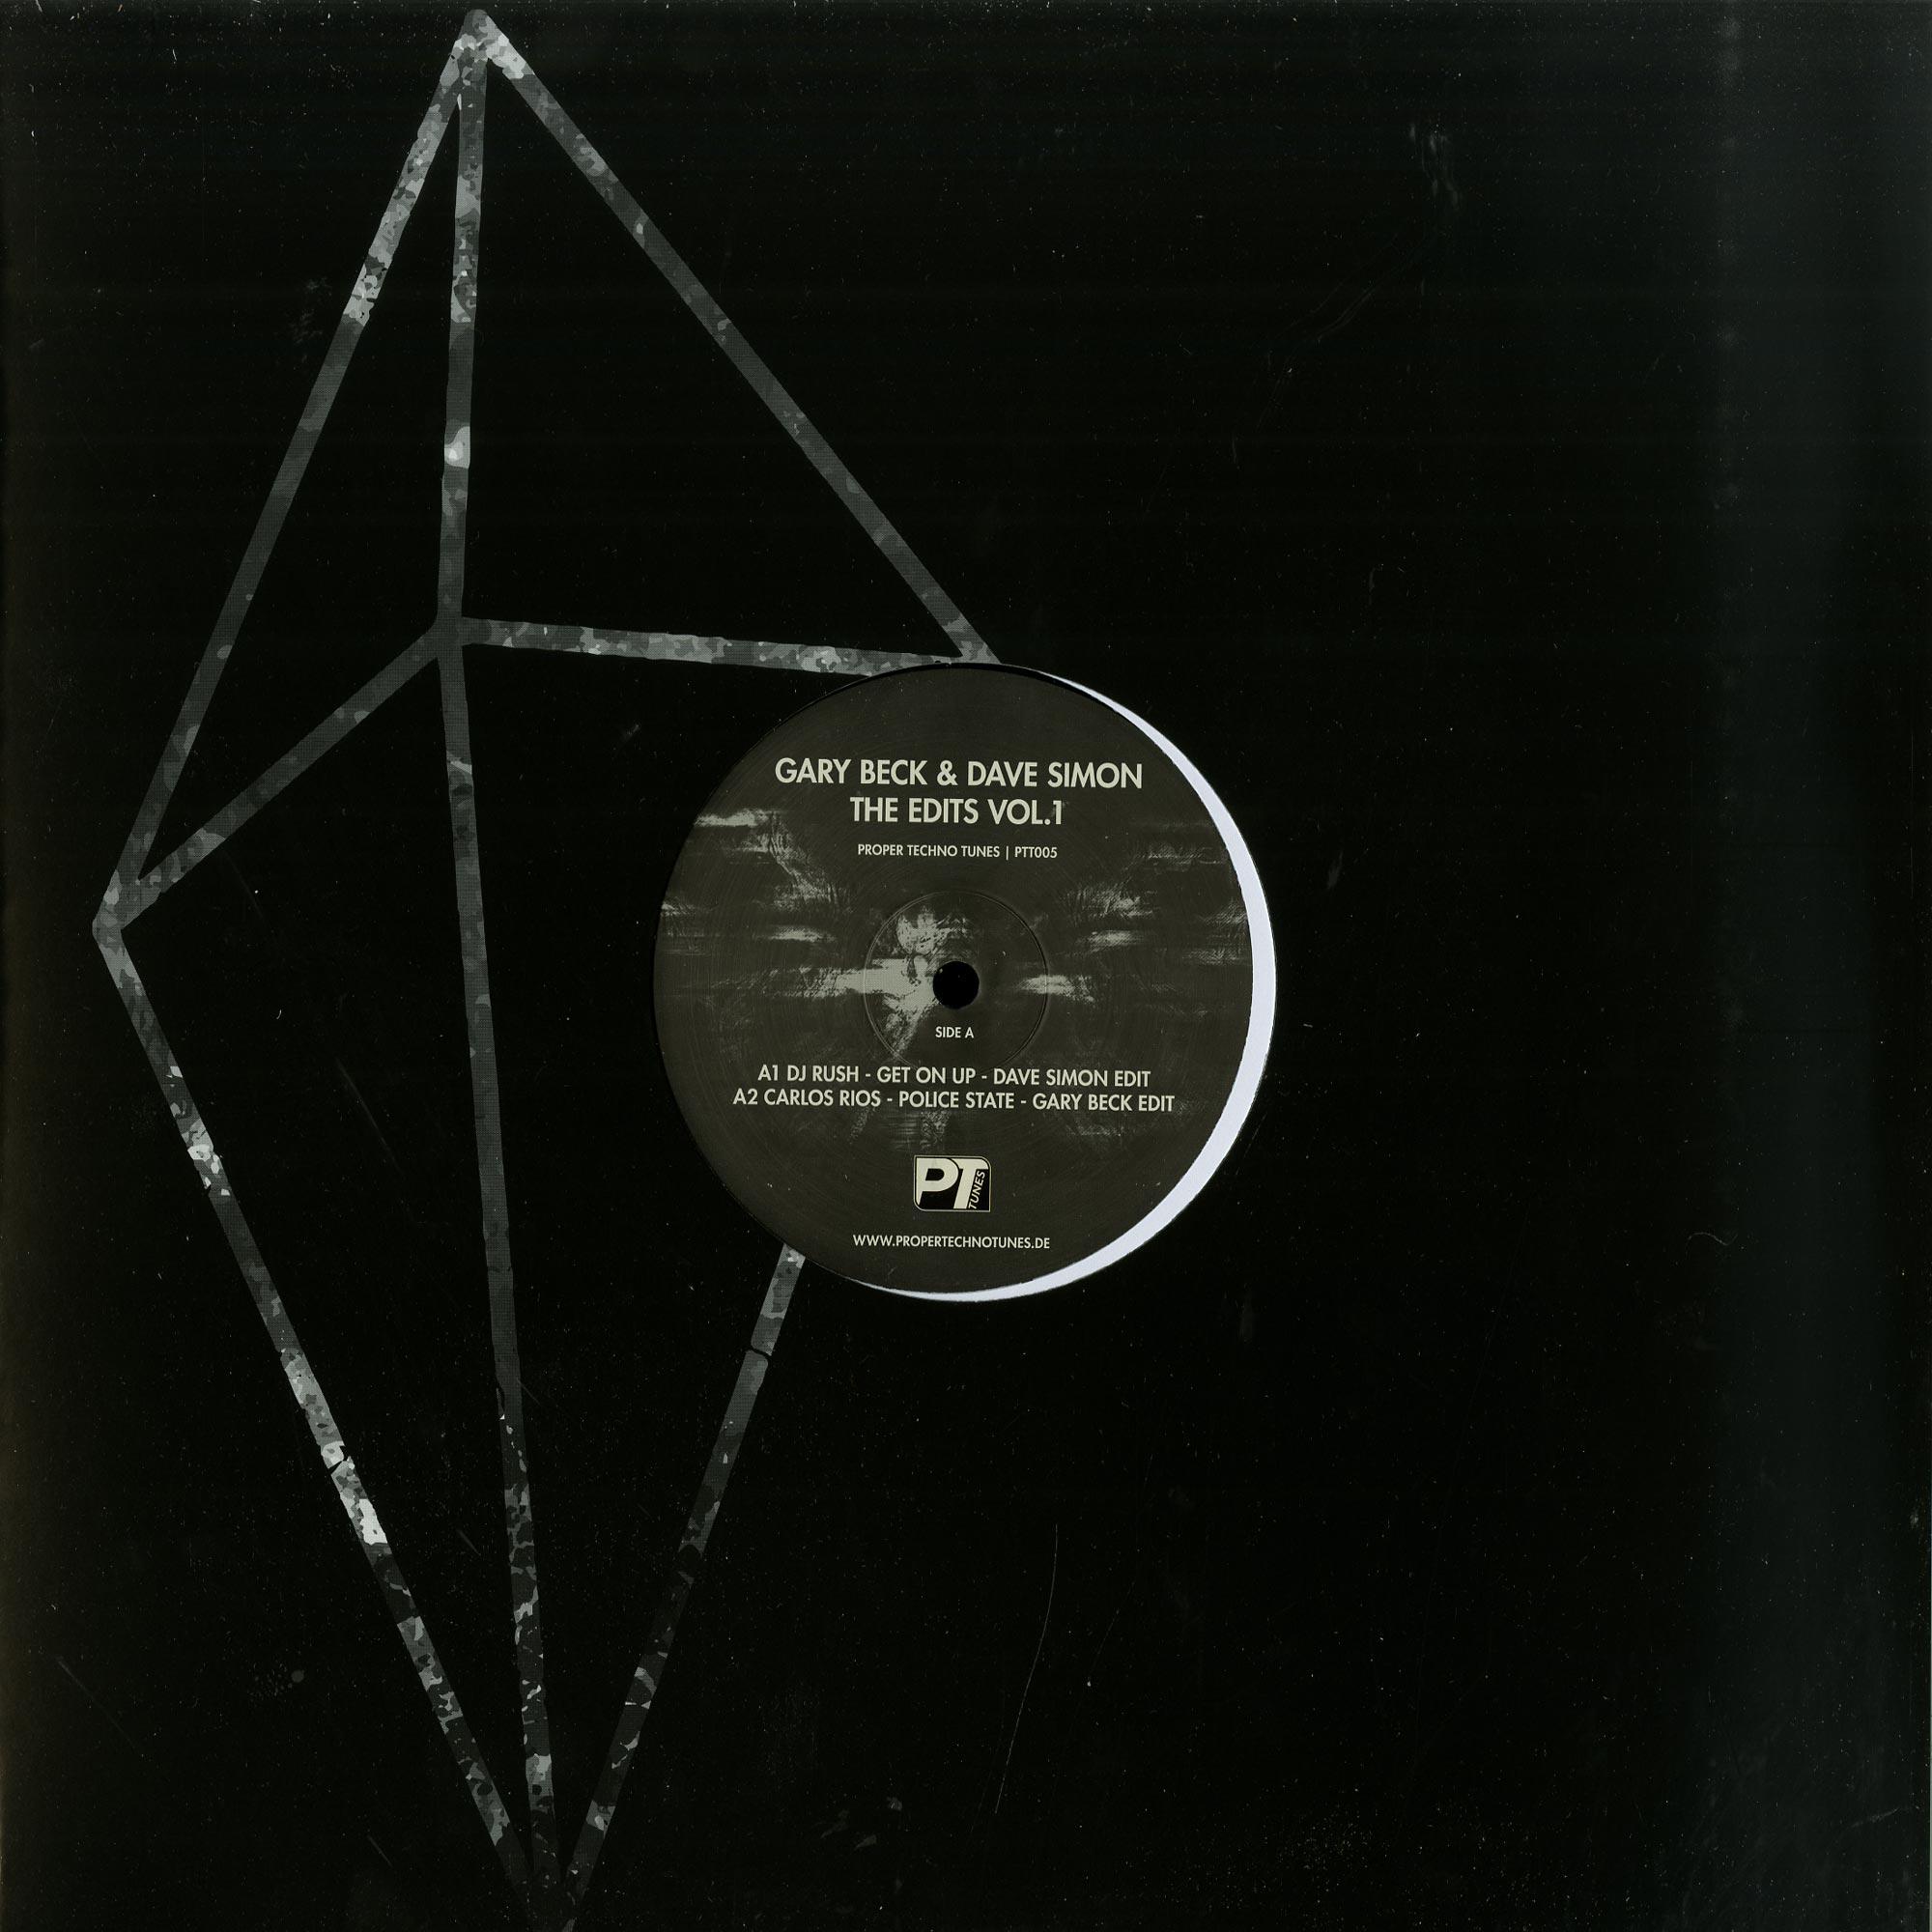 Gary Beck & Dave Simon - THE EDITS VOL. 1